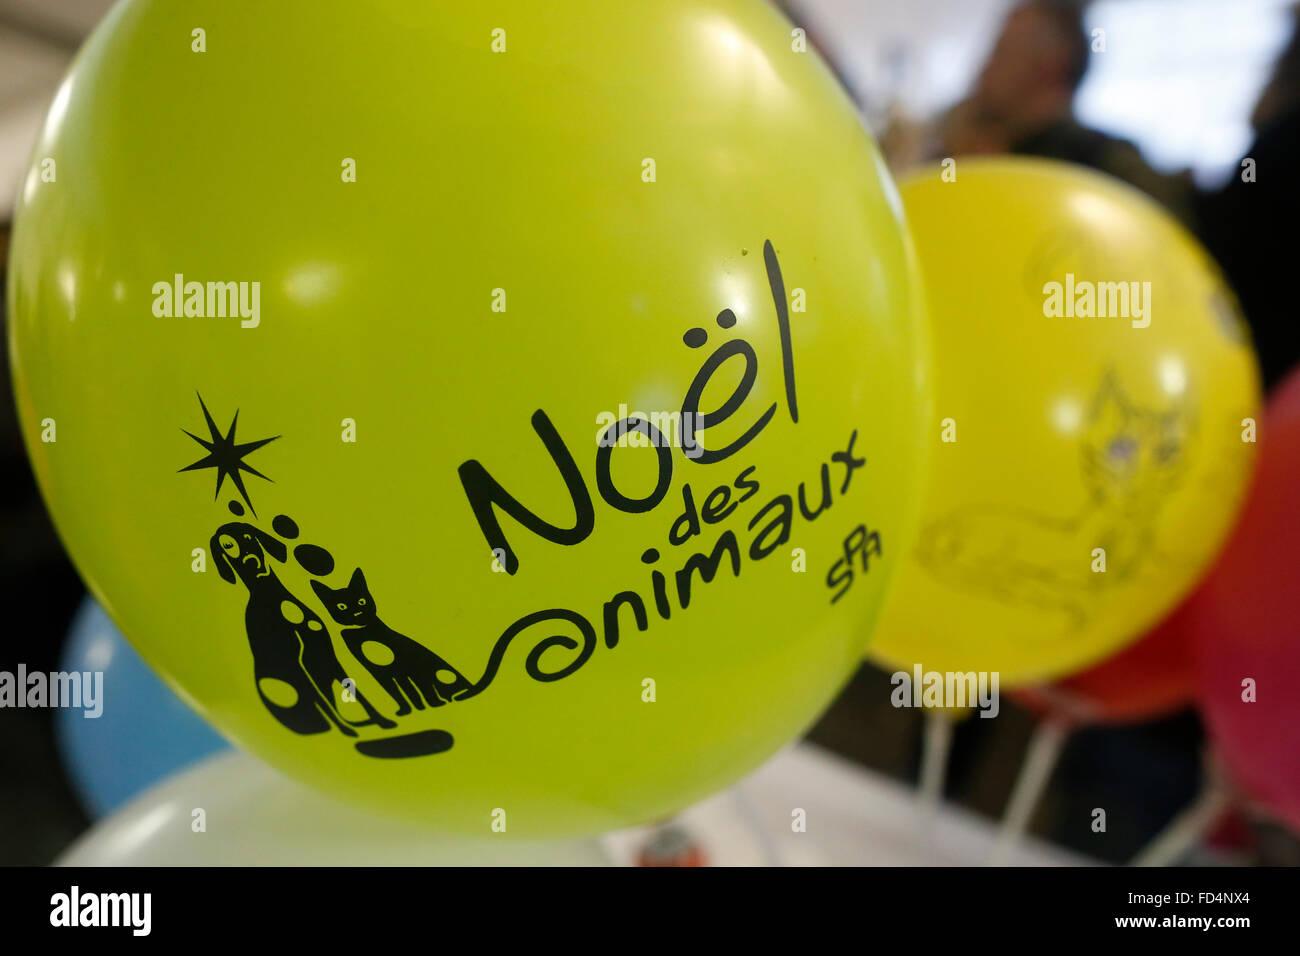 Animal protection organisation balloons. - Stock Image